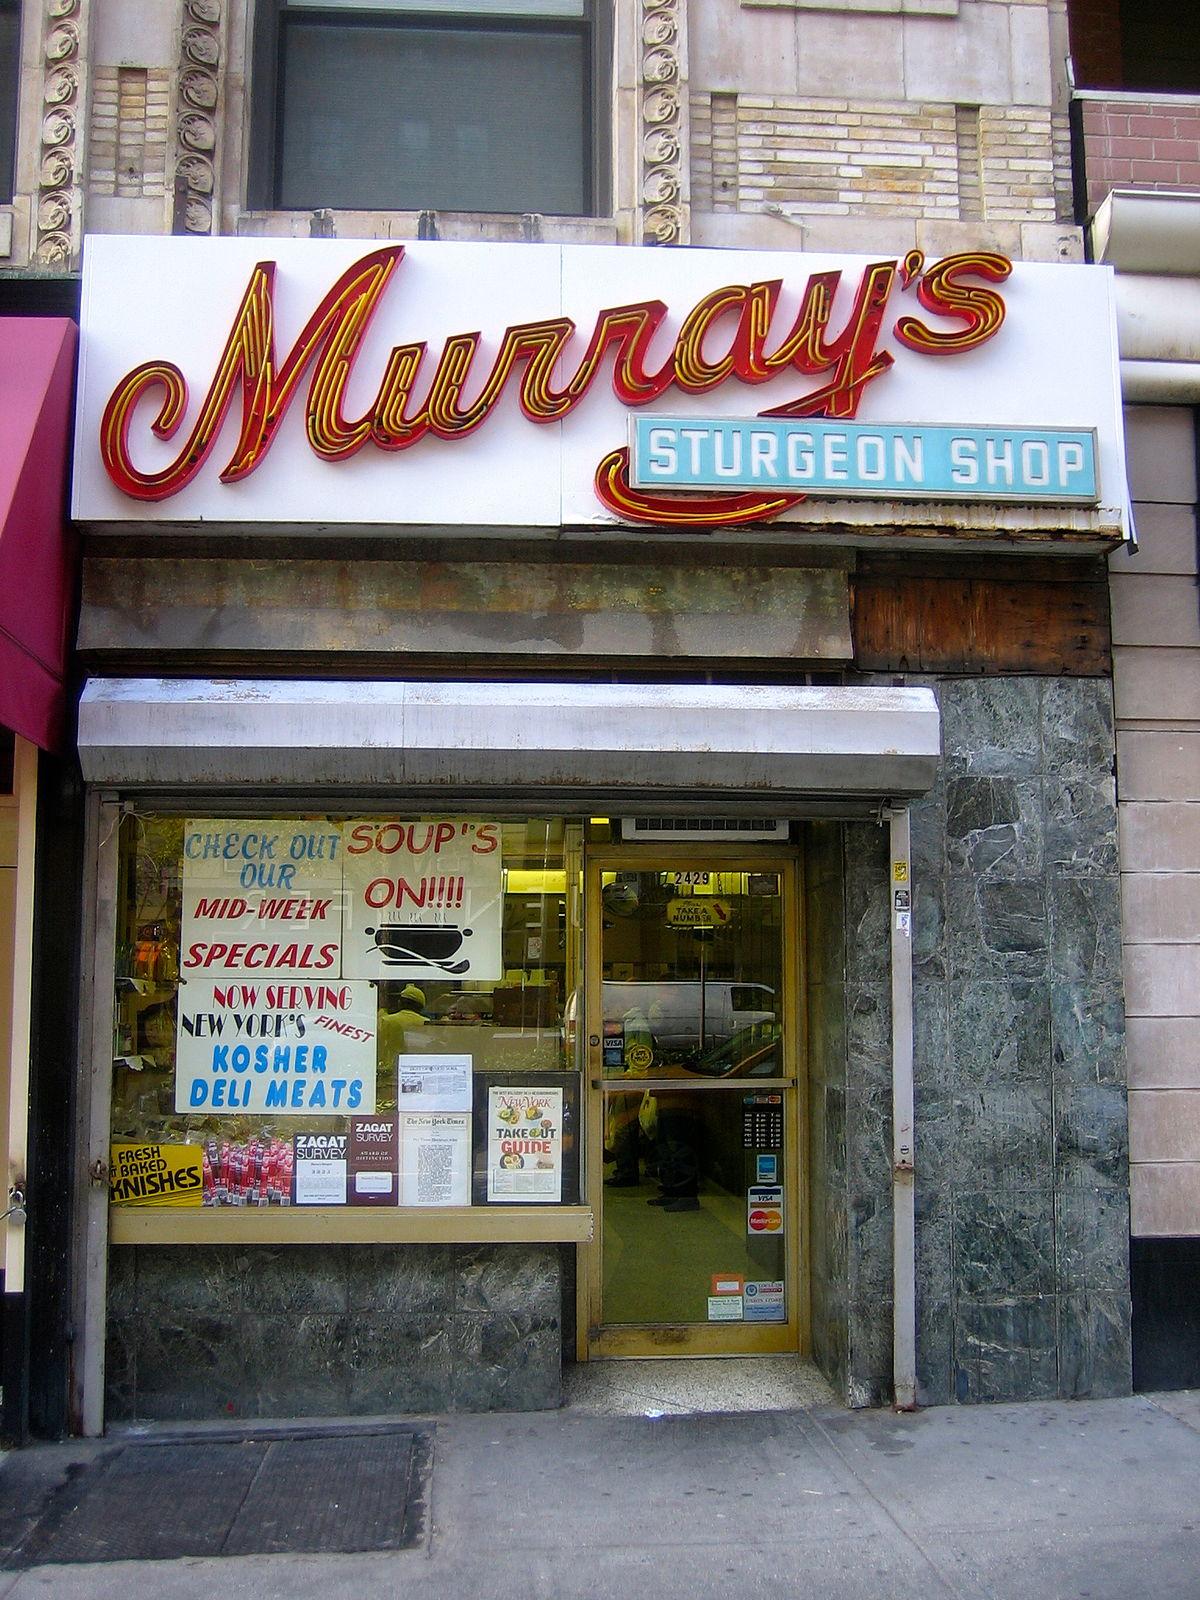 Murrays Sturgeon Shop  Wikipedia